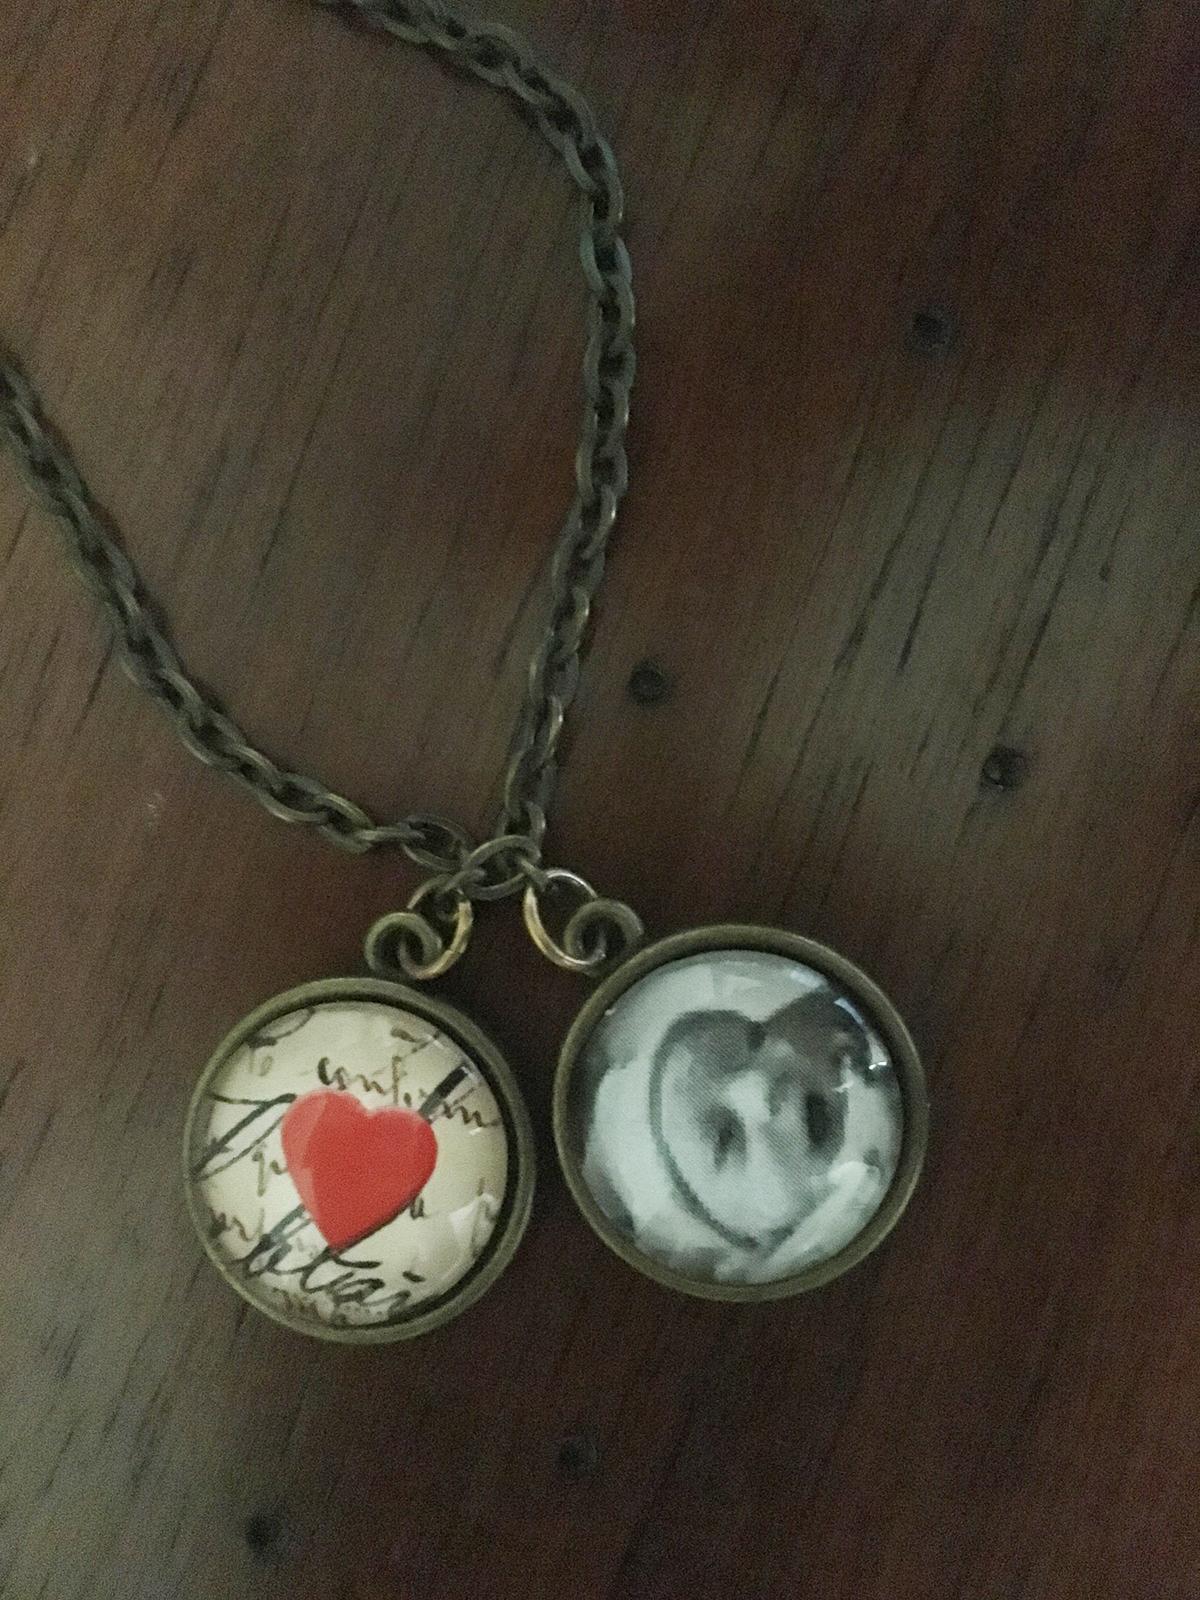 Mallory Leonard's cherished handmade necklace